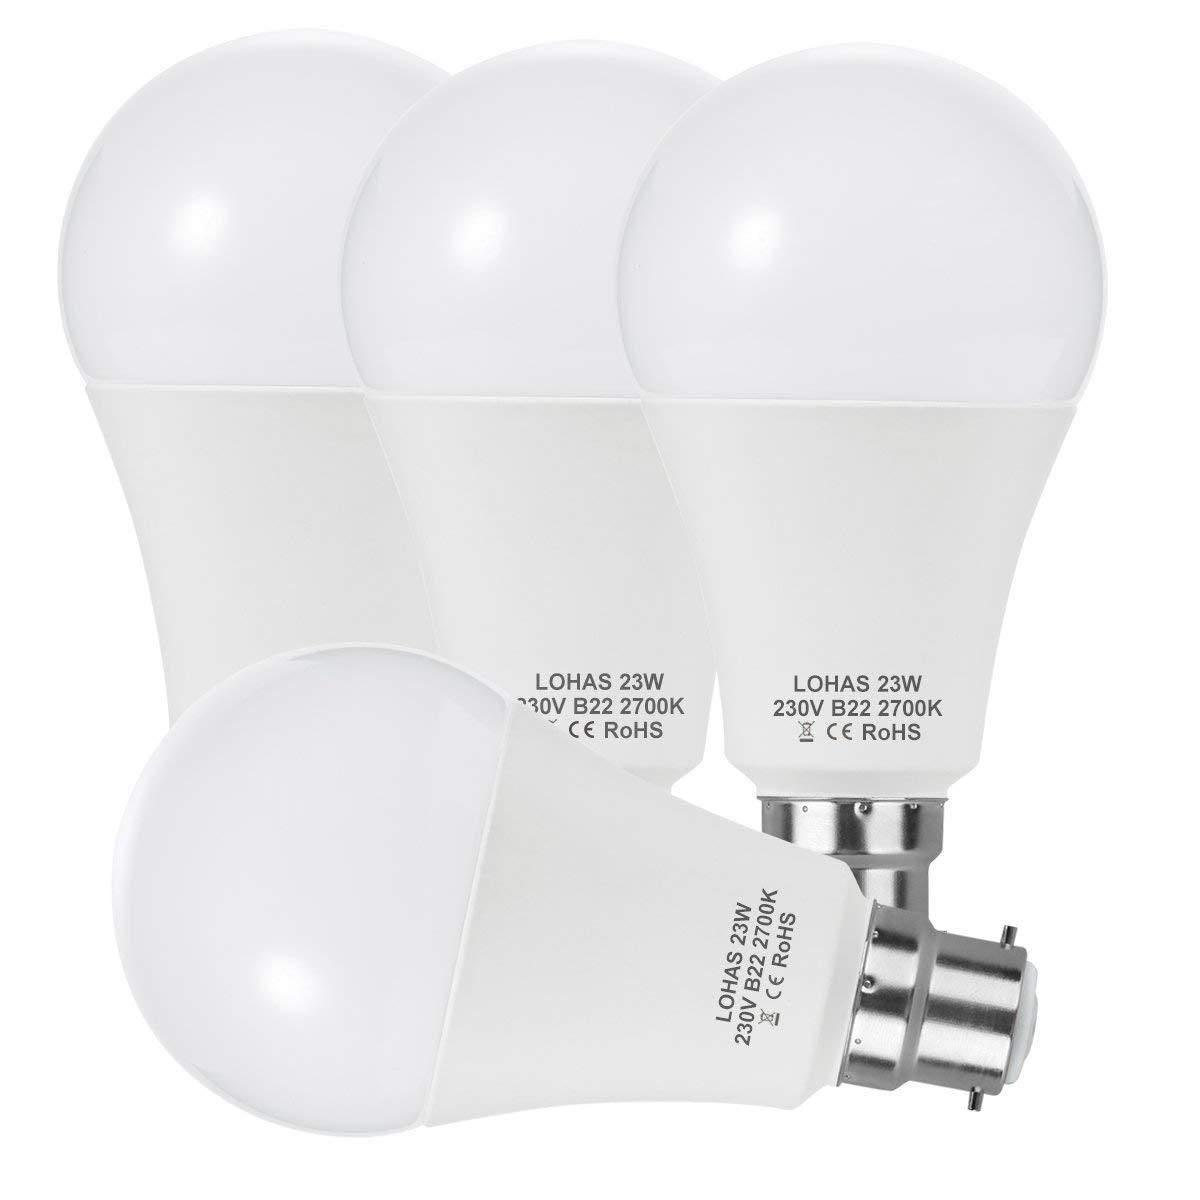 LED A65 B22 Bayonet Bulbs(200W Equivalent)23W LED Lights Warm White 2700K Super Bright 2500Lm Energy Saving Light Bulbs -4PACKLED A65 B22 Bayonet Bulbs(200W Equivalent)23W LED Lights Warm White 2700K Super Bright 2500Lm Energy Saving Light Bulbs -4PACK